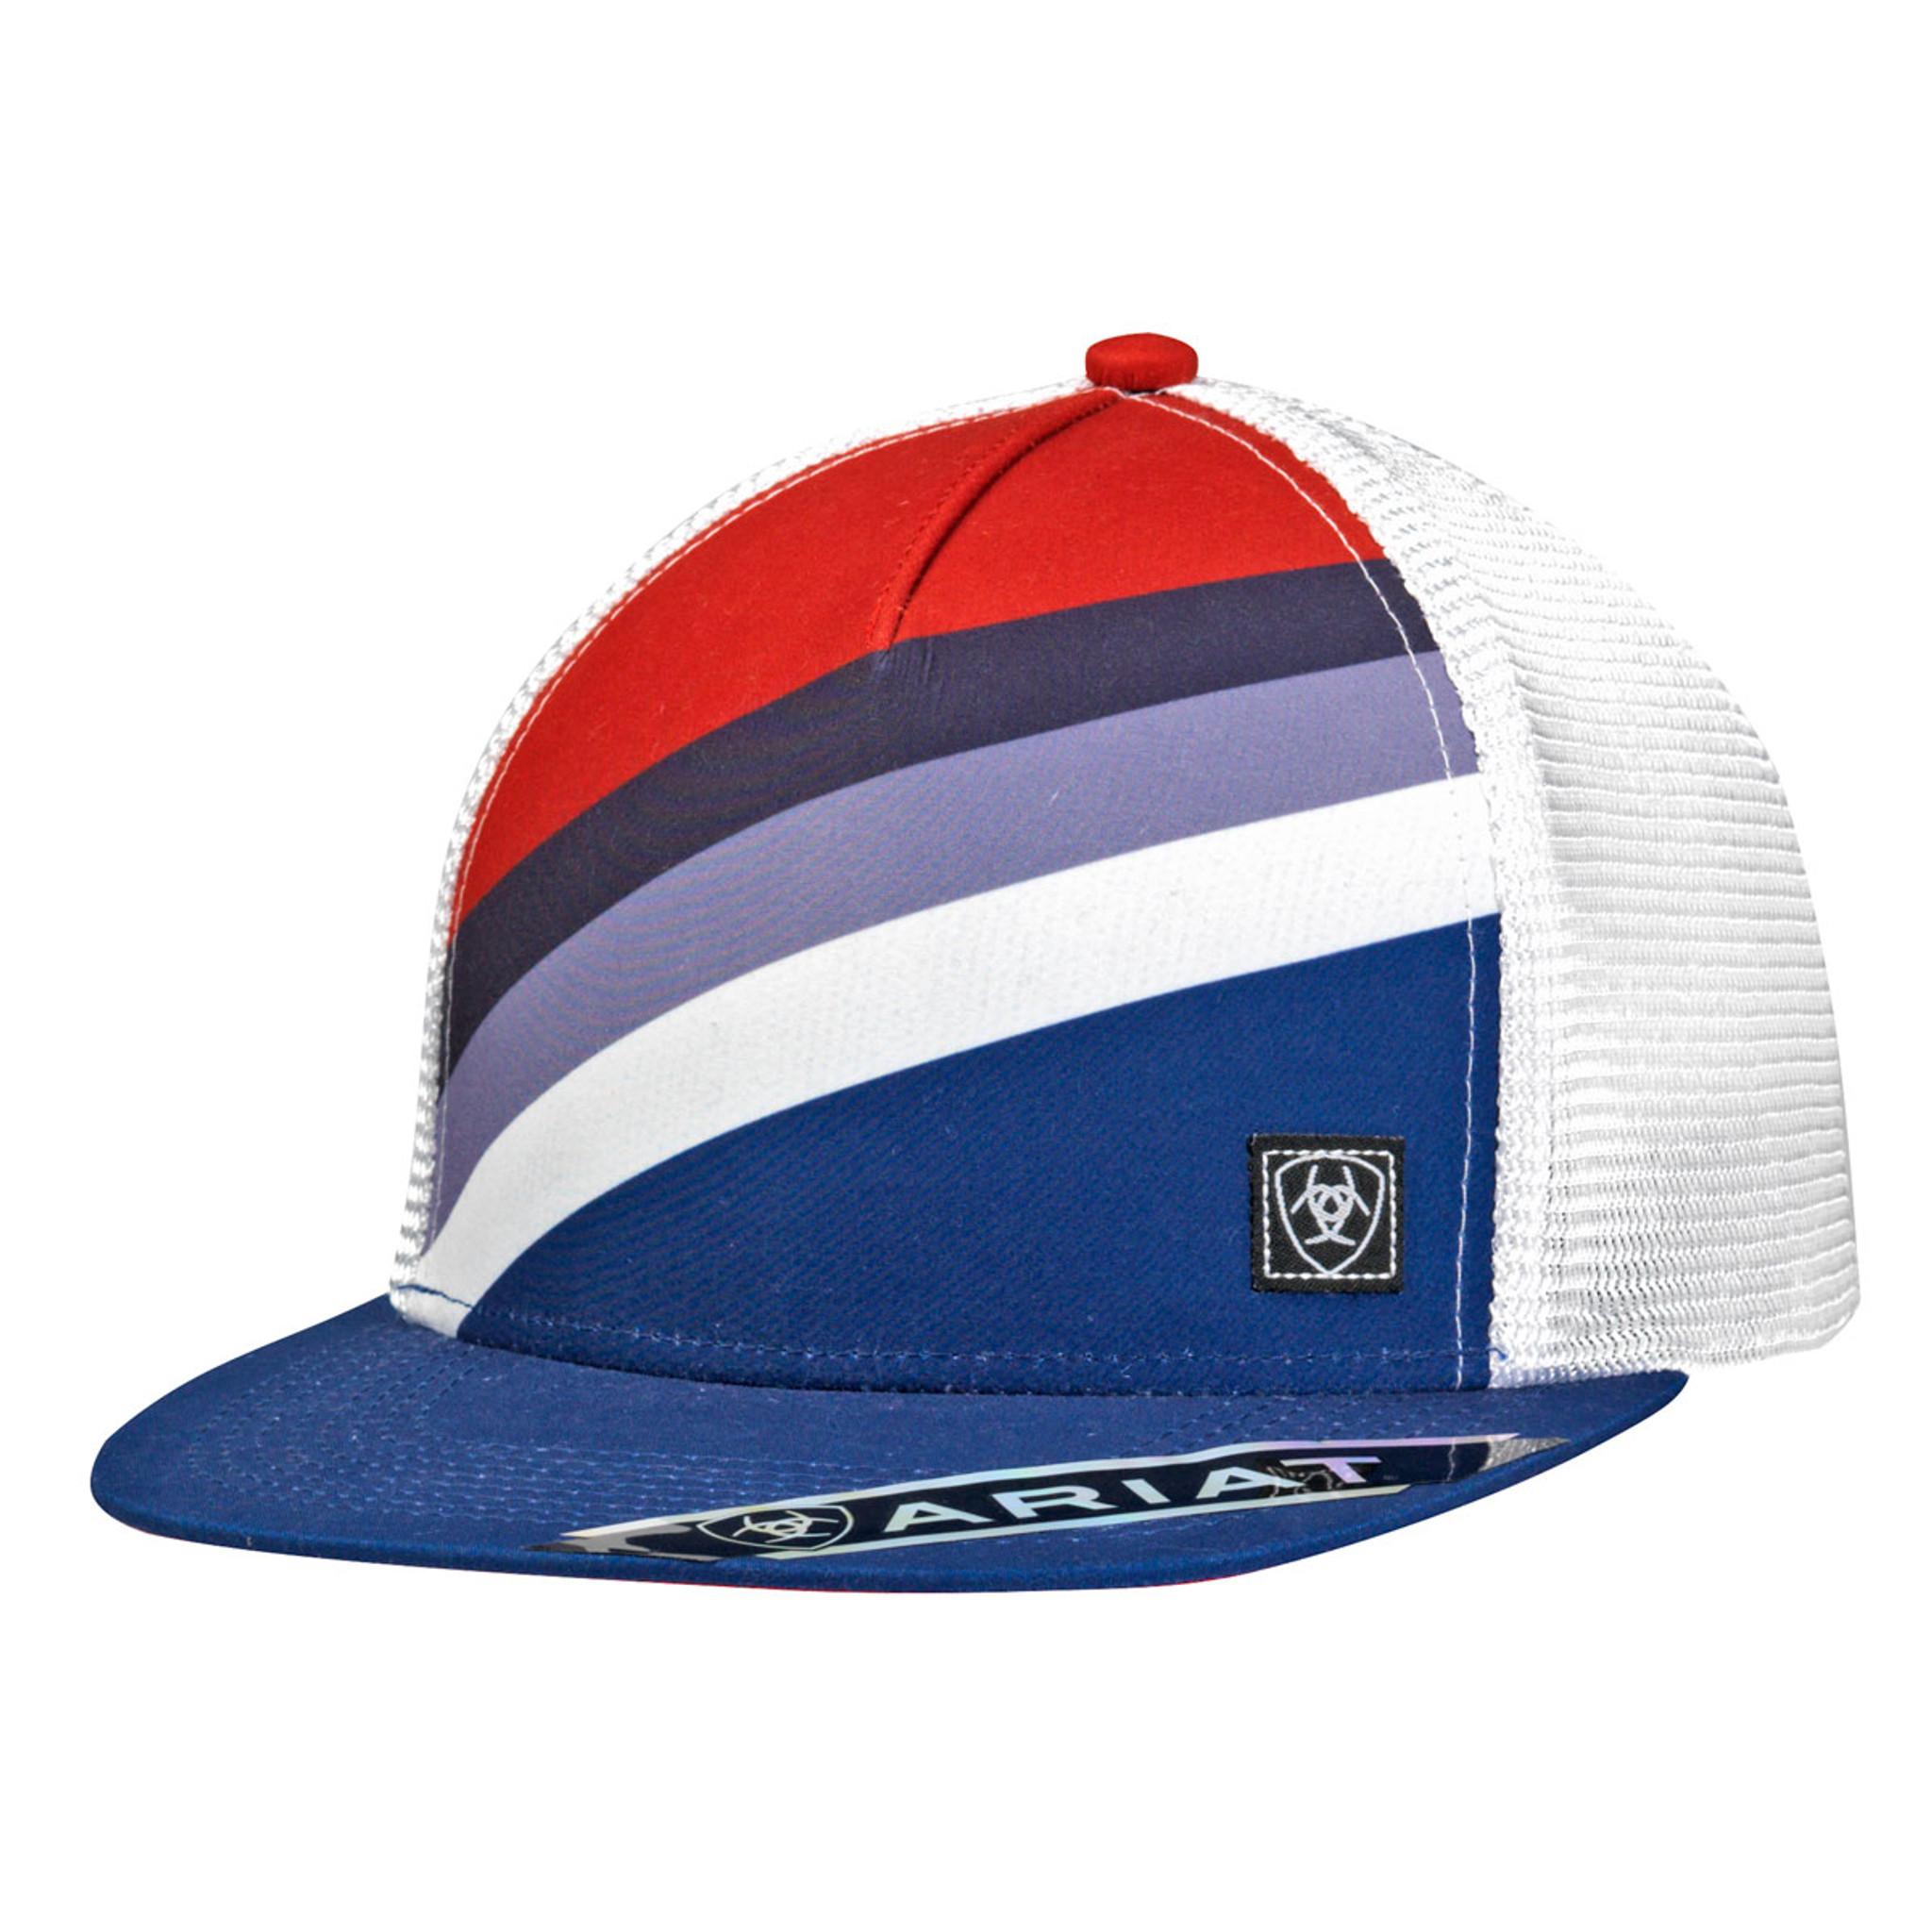 Men's Ariat Cap, Blue and Red Diagonal Stripes